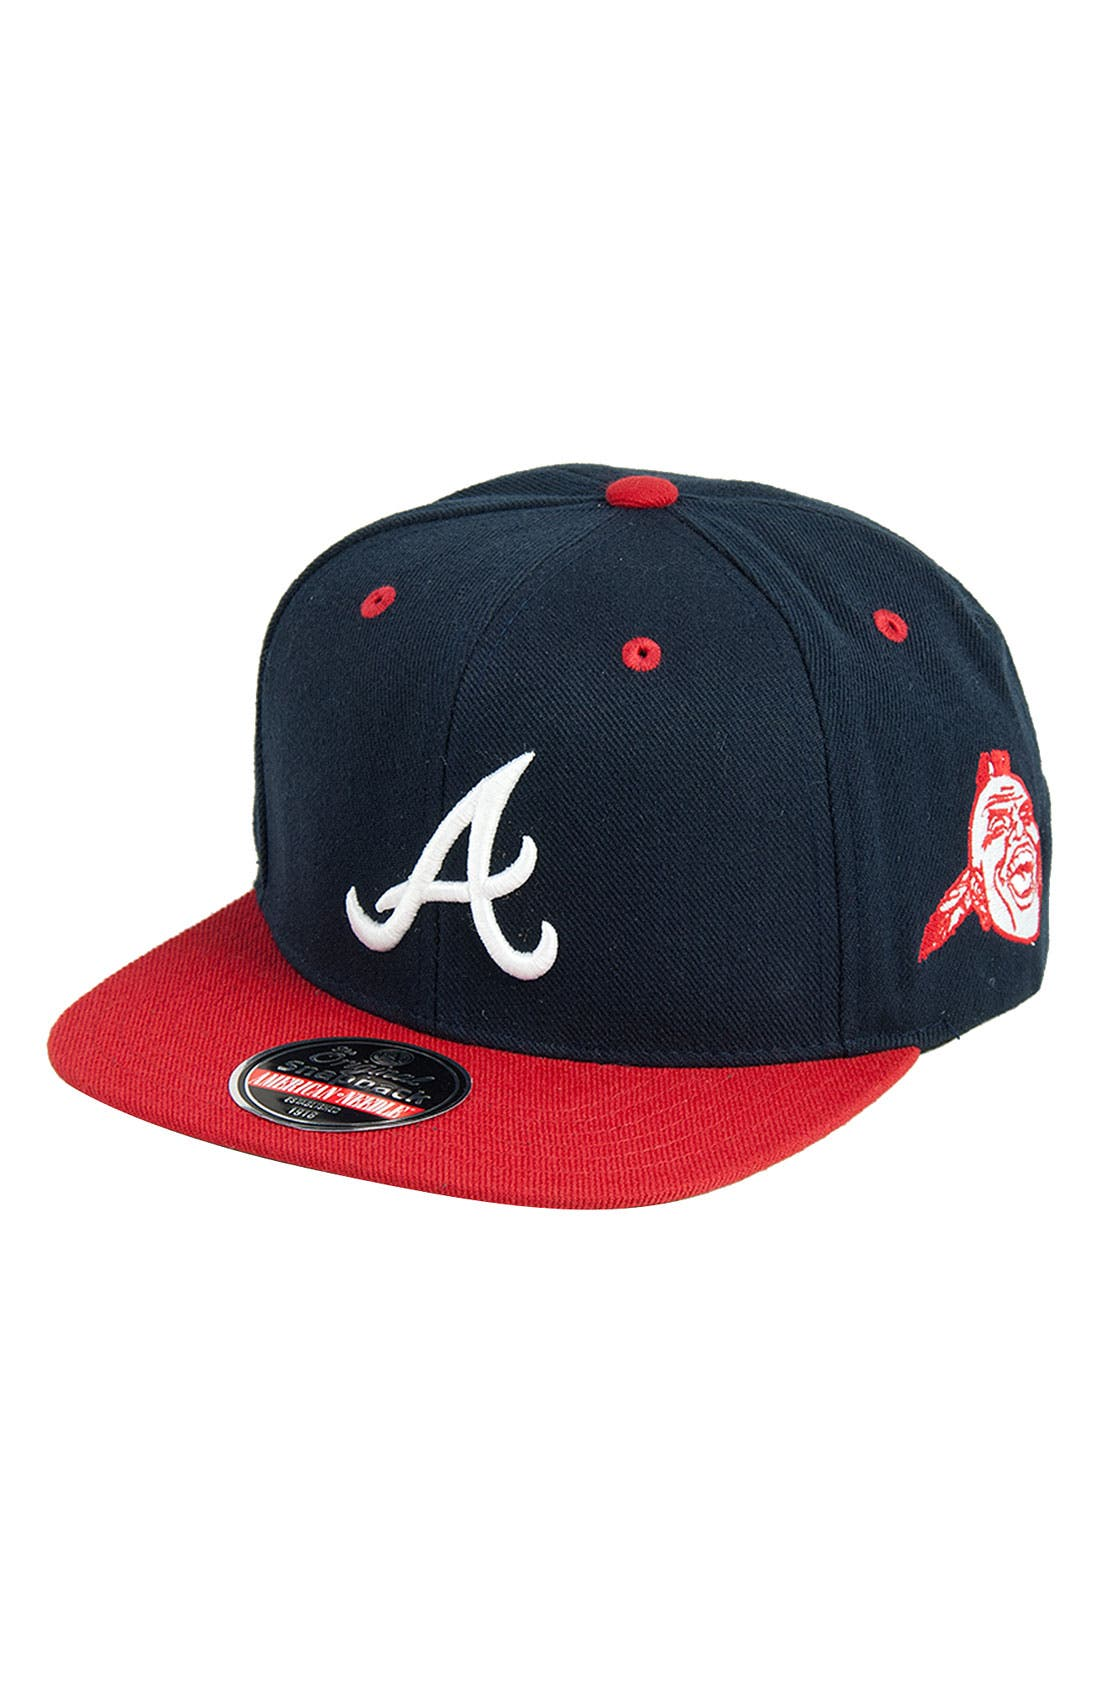 Alternate Image 1 Selected - American Needle 'Blockhead Braves' Snapback Baseball Cap